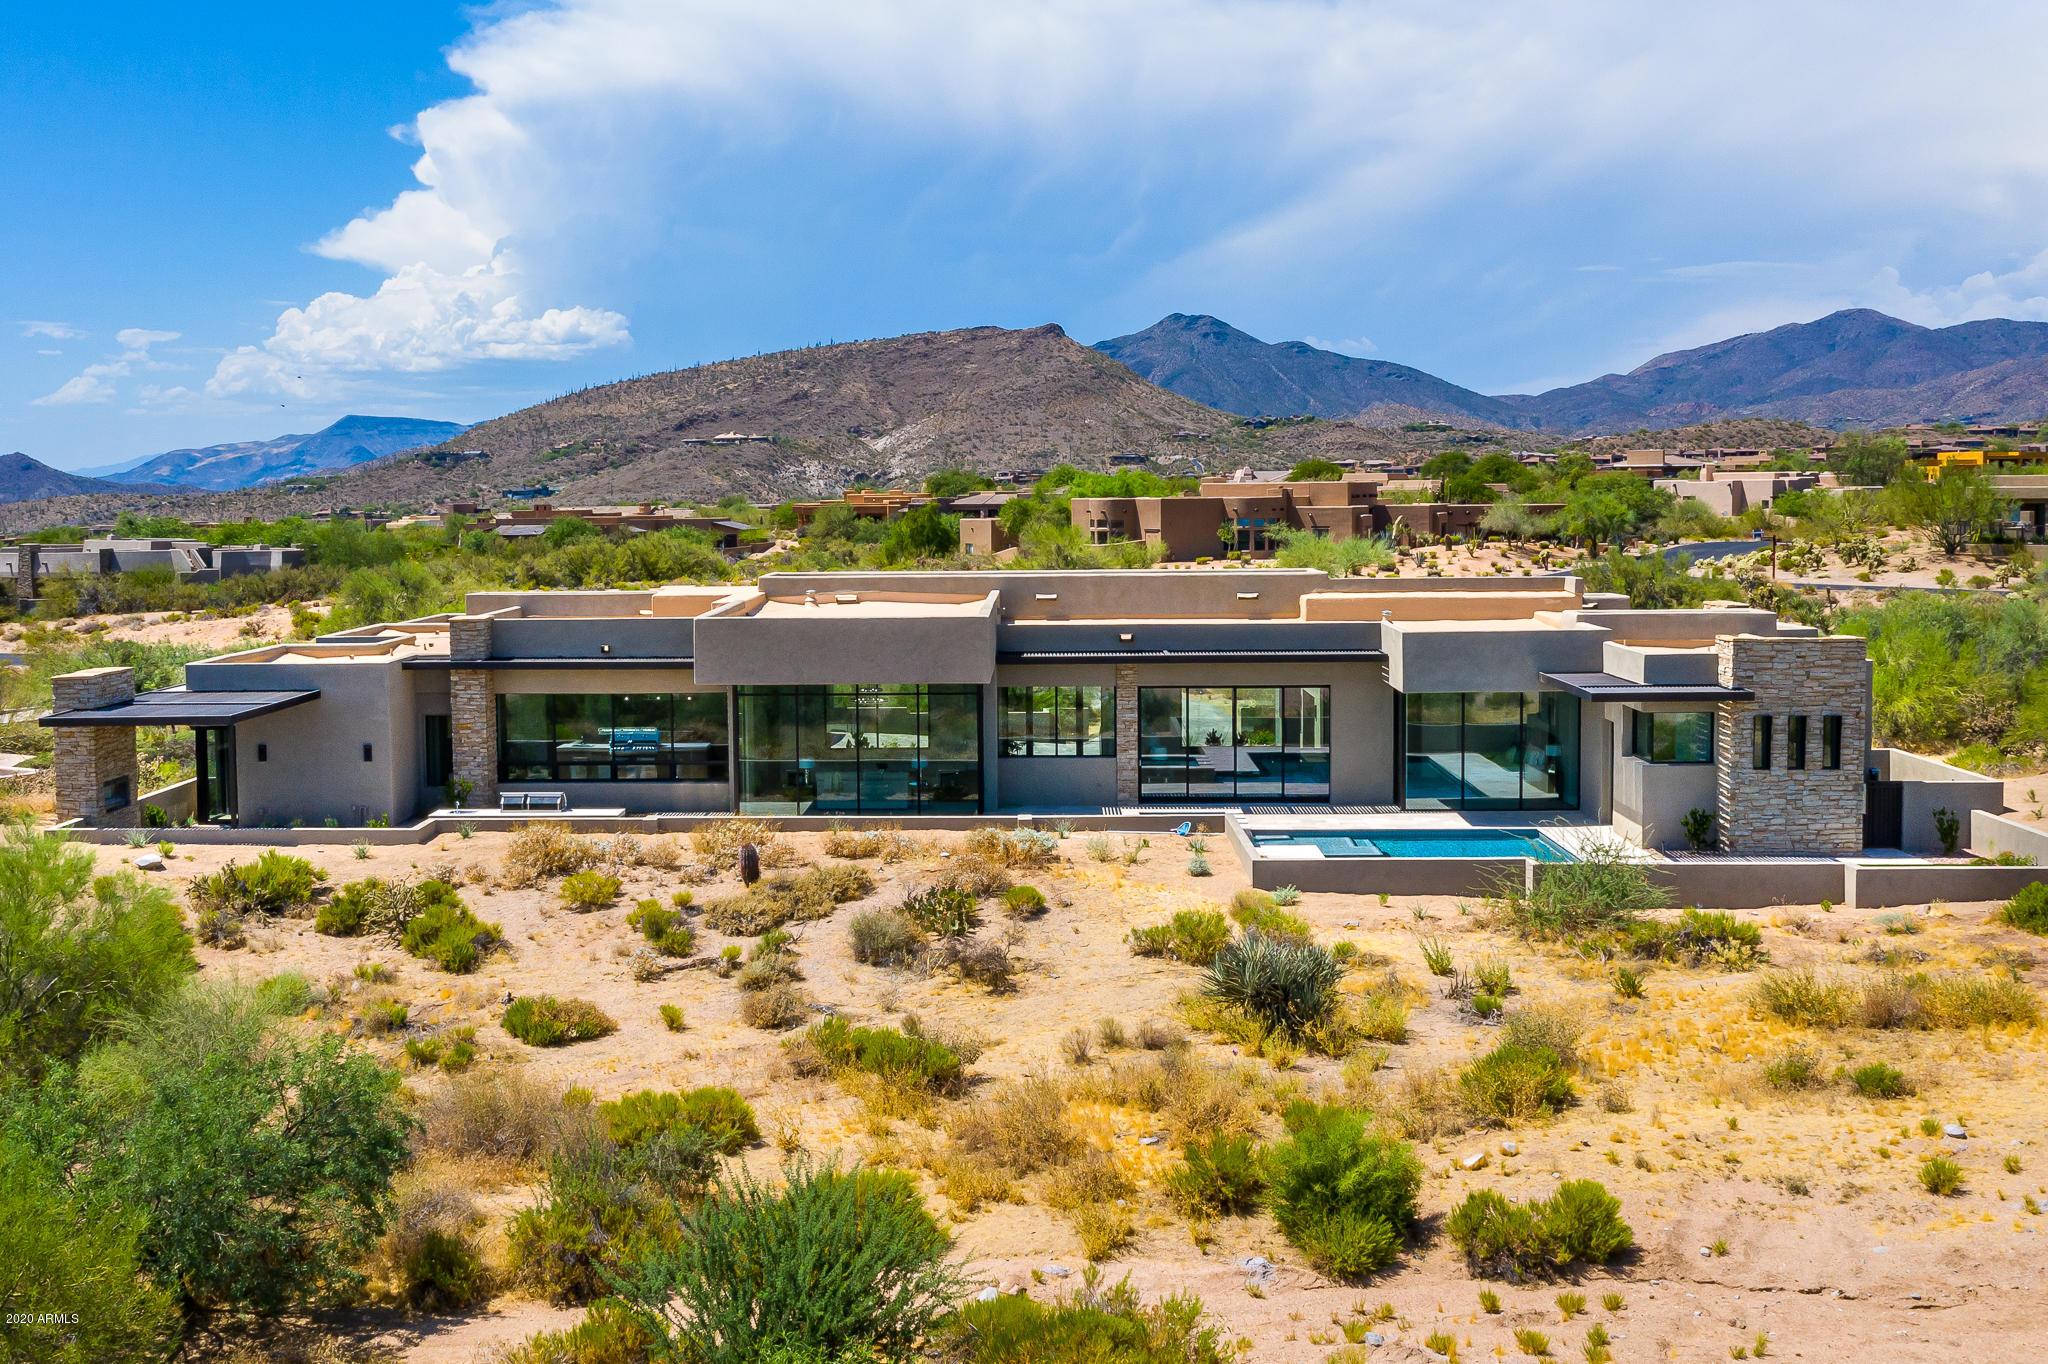 9945 SUNDANCE Trail, Scottsdale, Arizona 85262, 5 Bedrooms Bedrooms, ,6 BathroomsBathrooms,Residential,For Sale,SUNDANCE,6159080